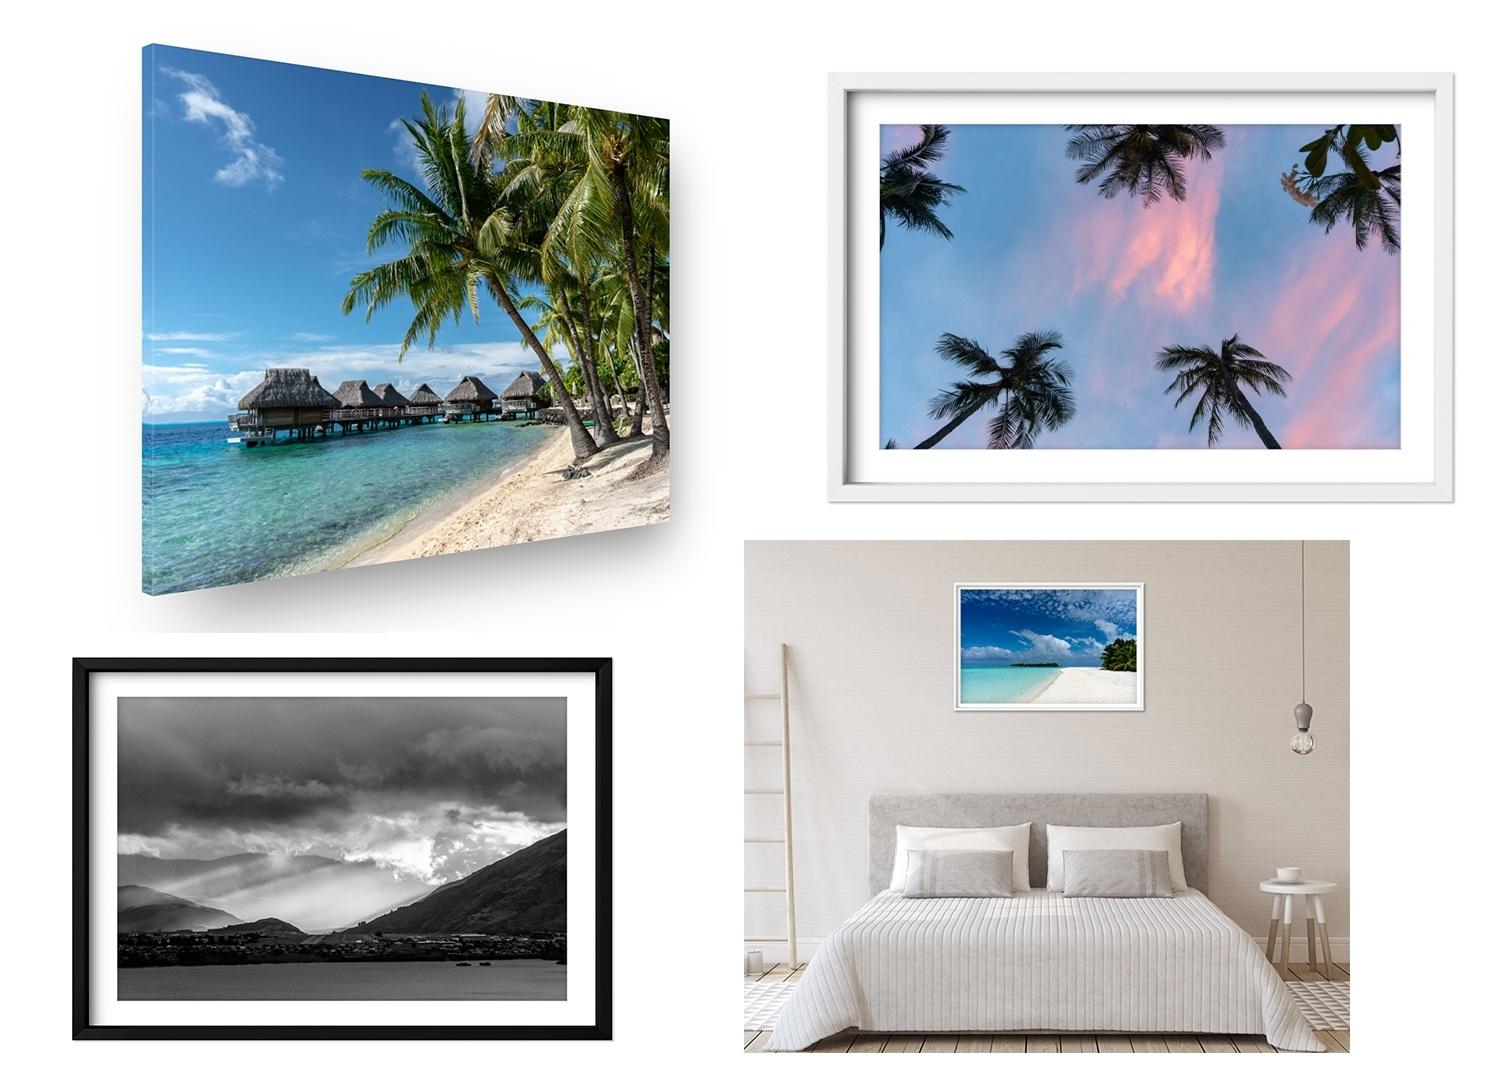 Print+Shop+Image.jpg